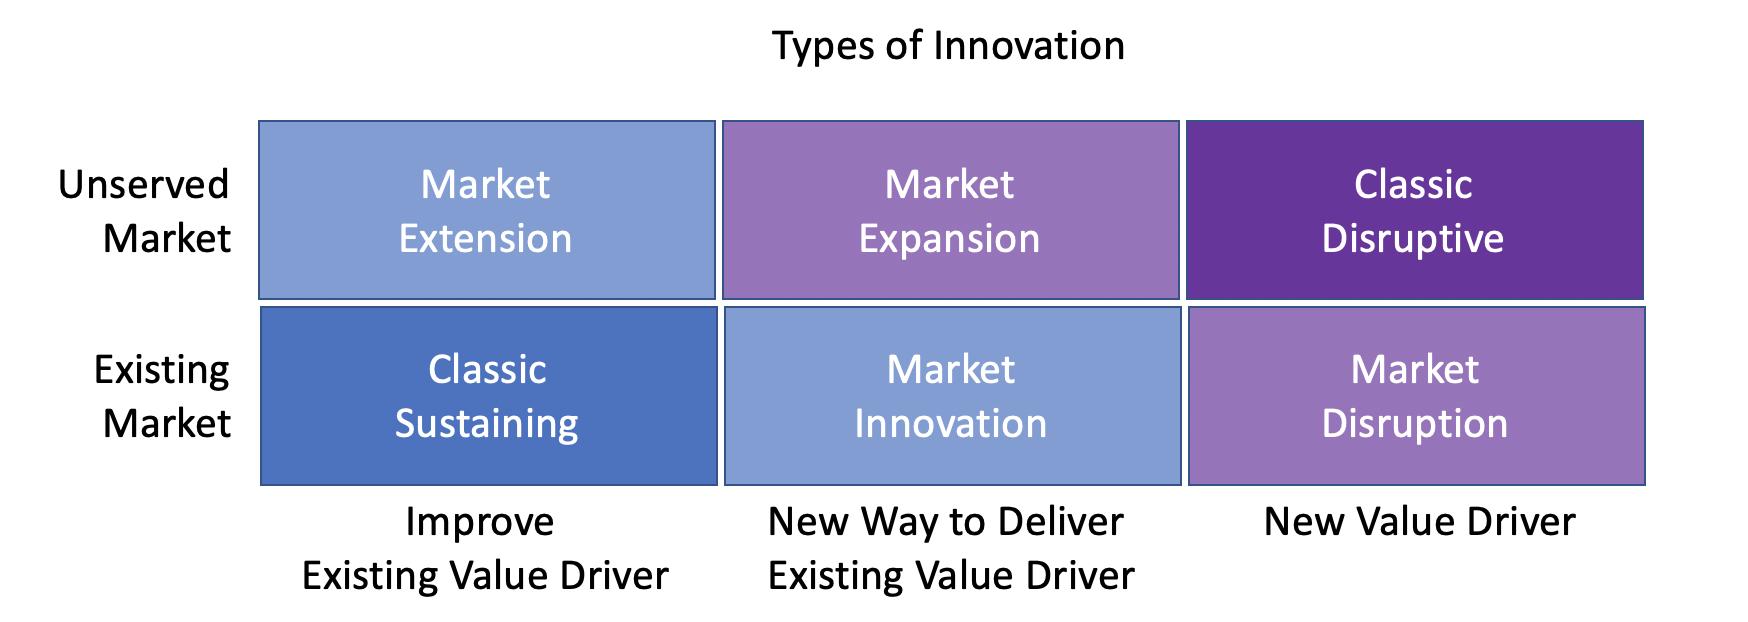 Types of Innovation